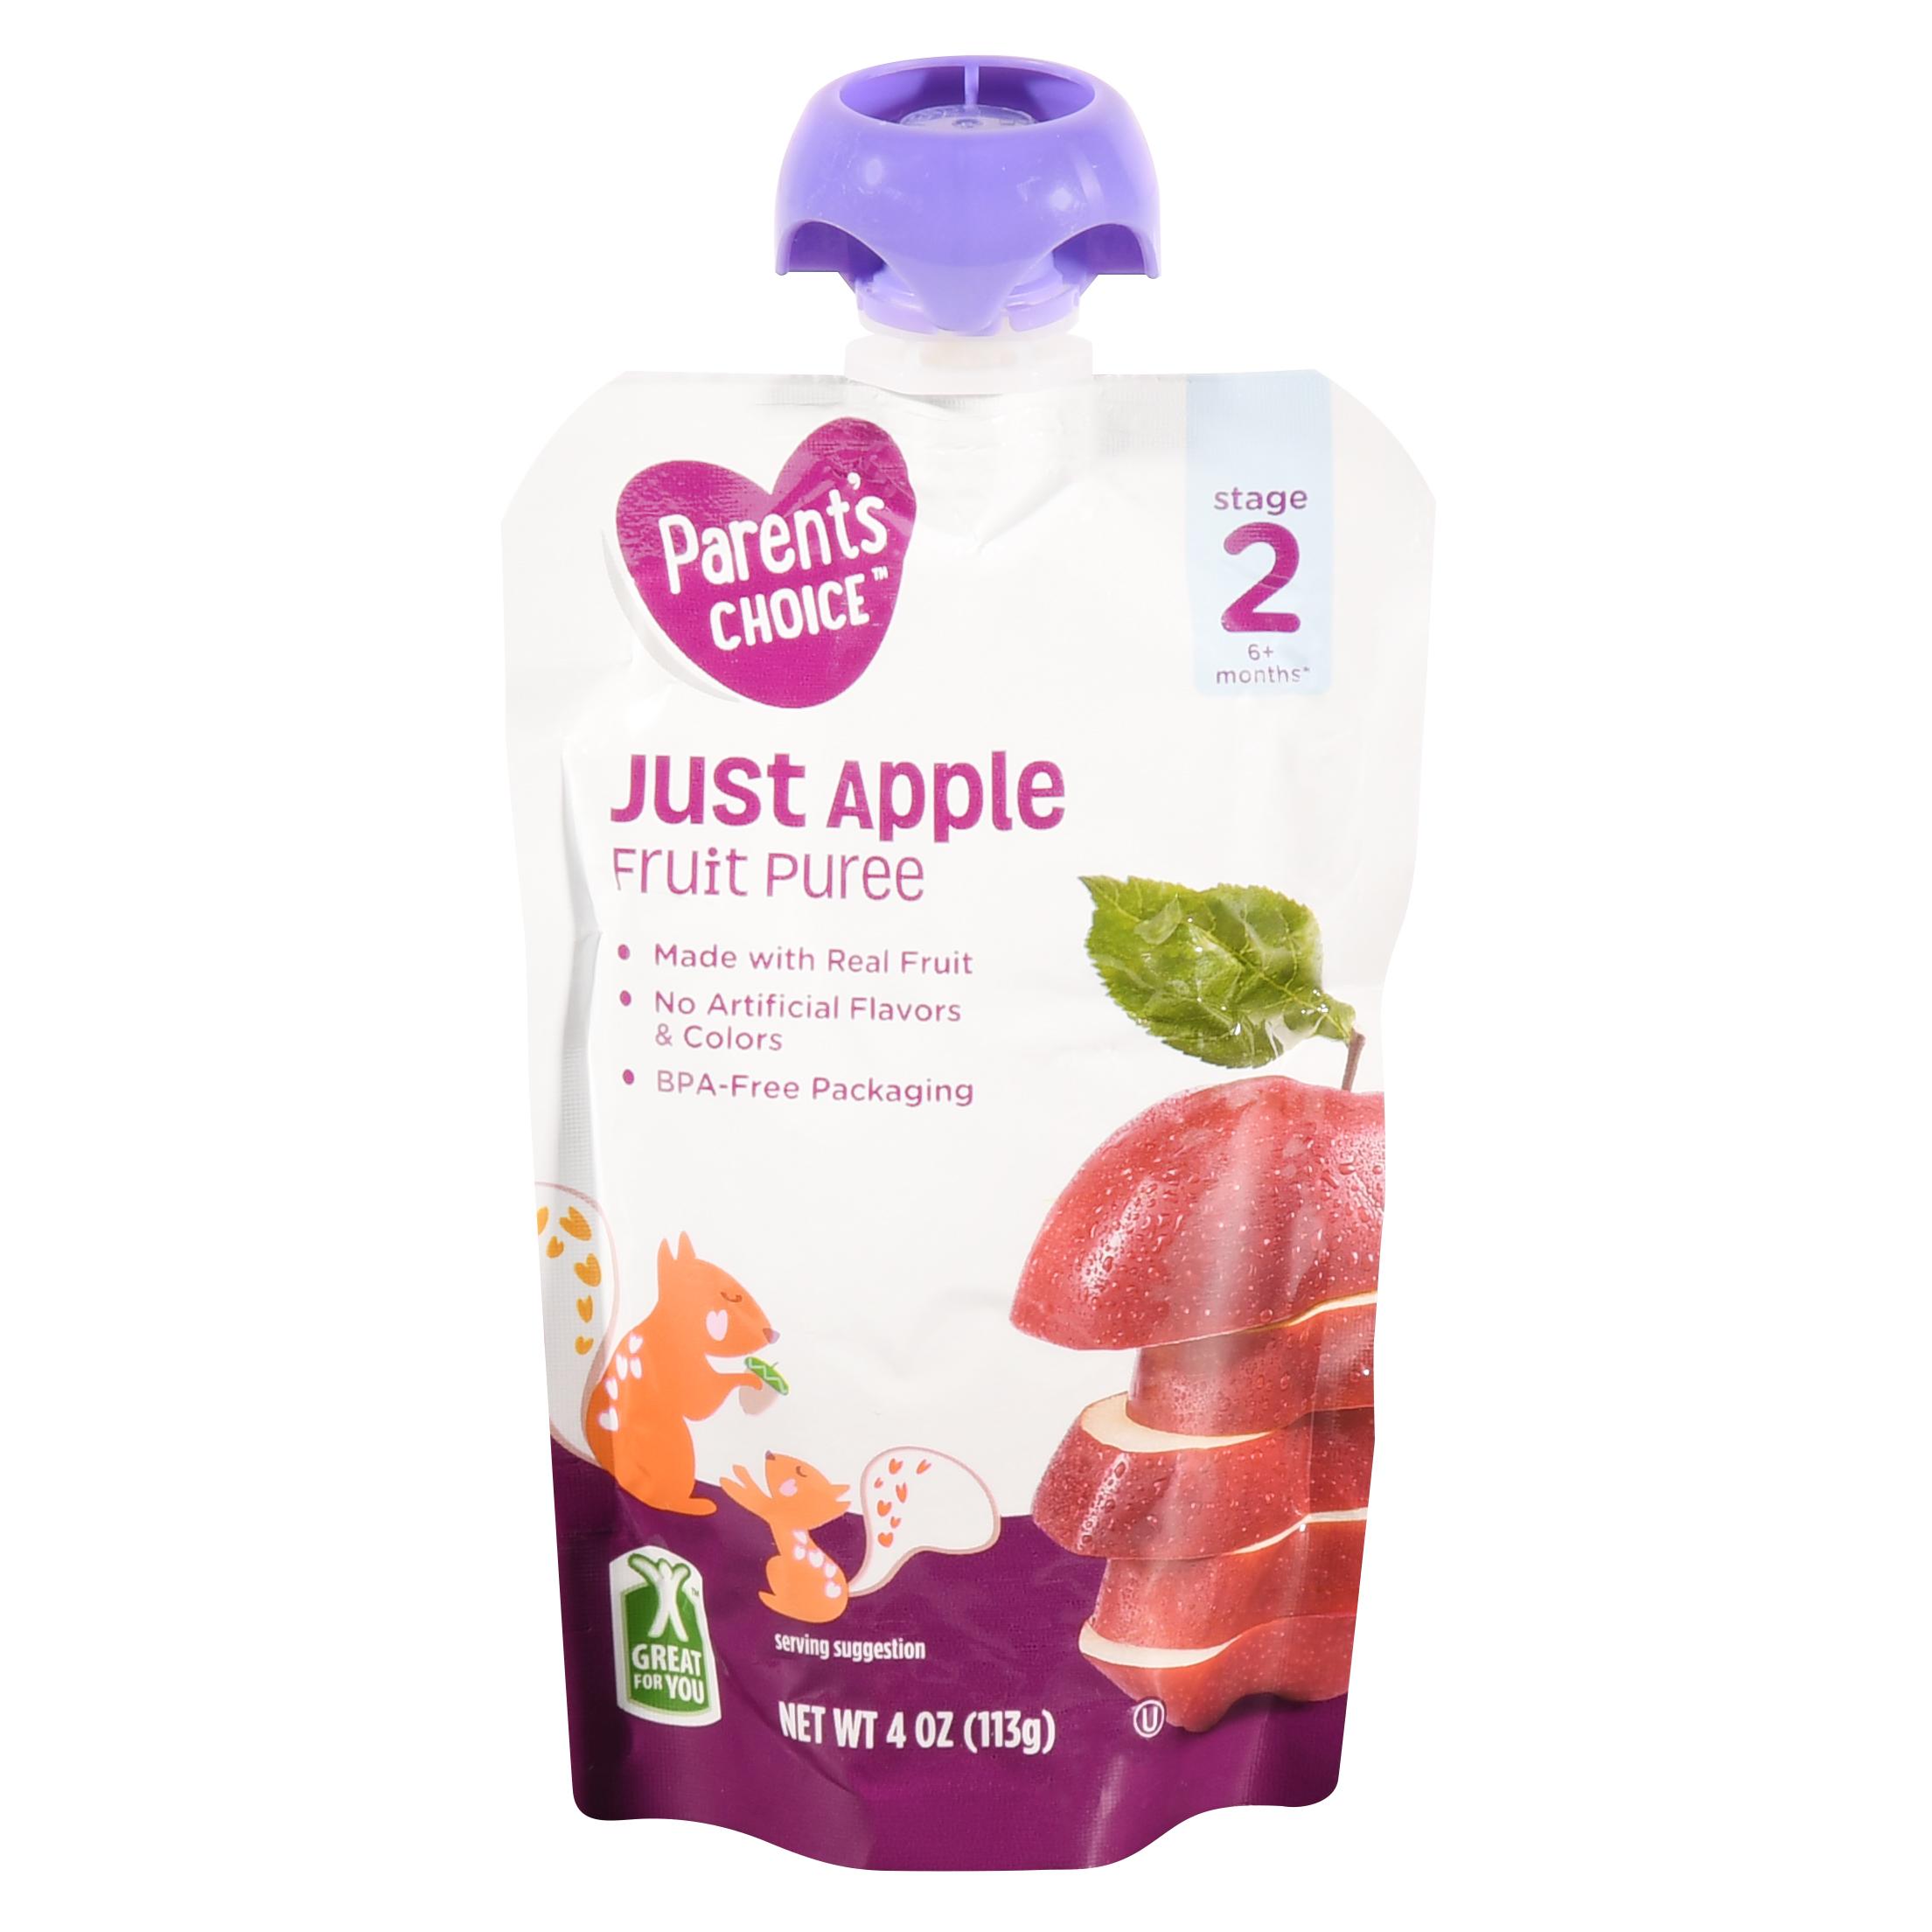 Parent's Choice Just Apple, Stage 2, 4 oz Pouch